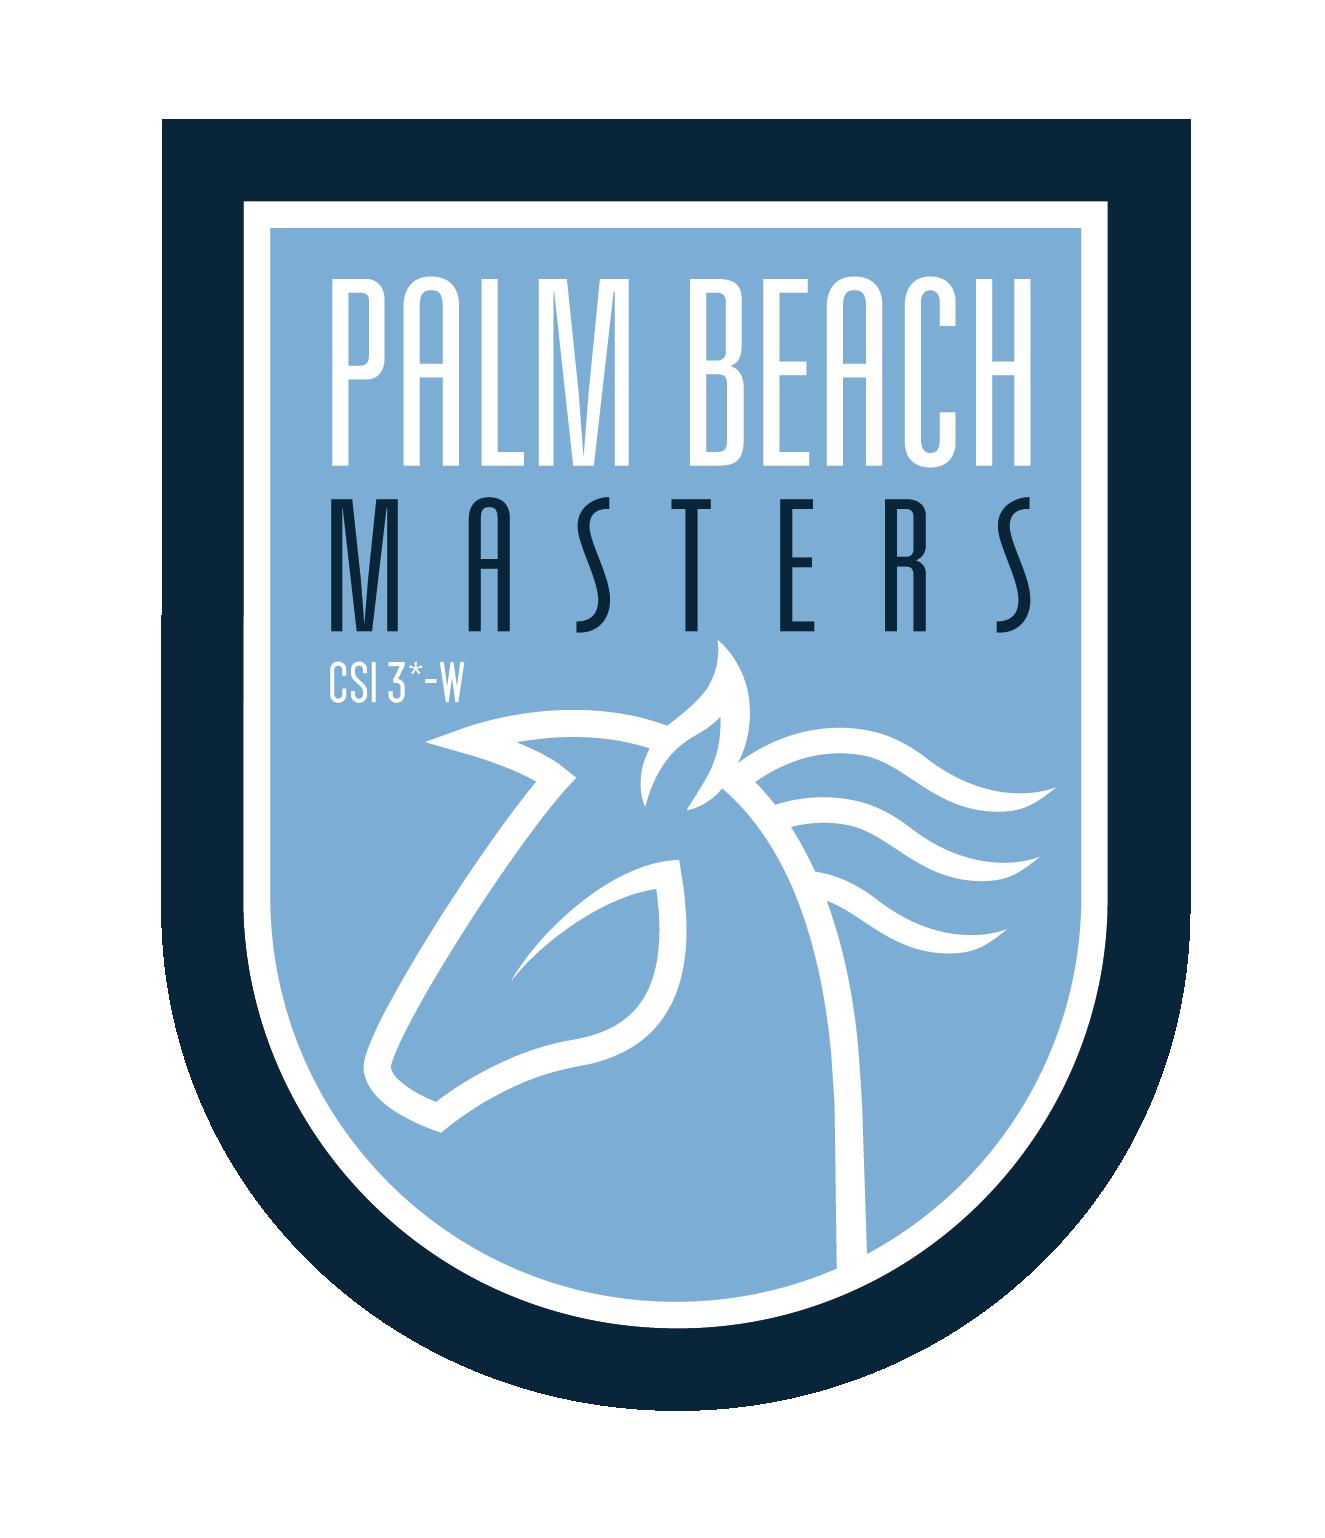 Palm Beach Masters.jpg